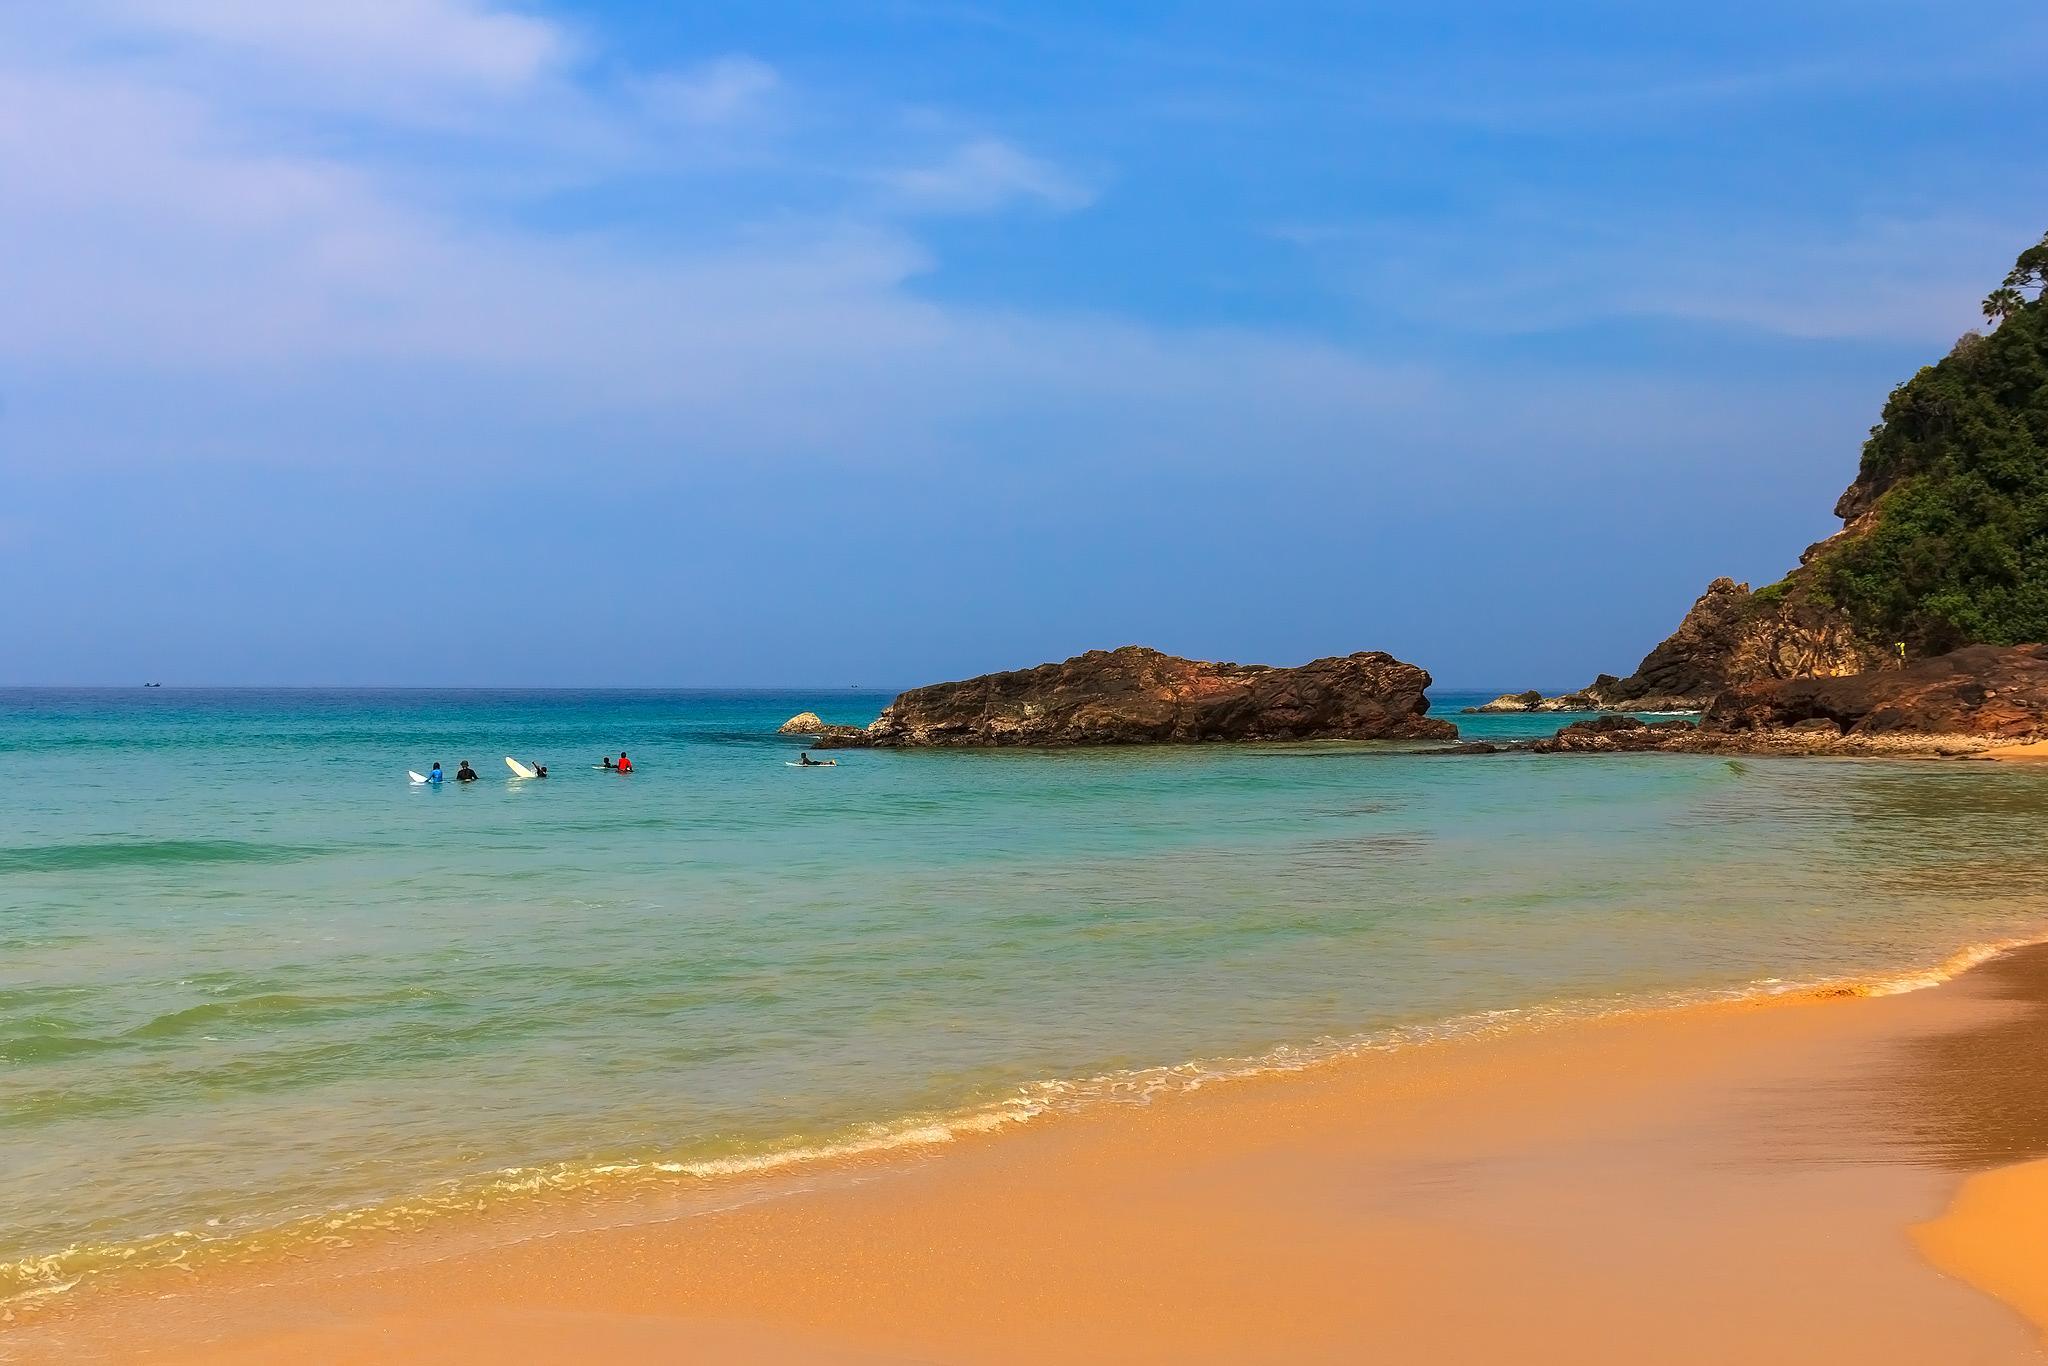 Khao nayak beach Phang Nga Thailand by ichoo2000